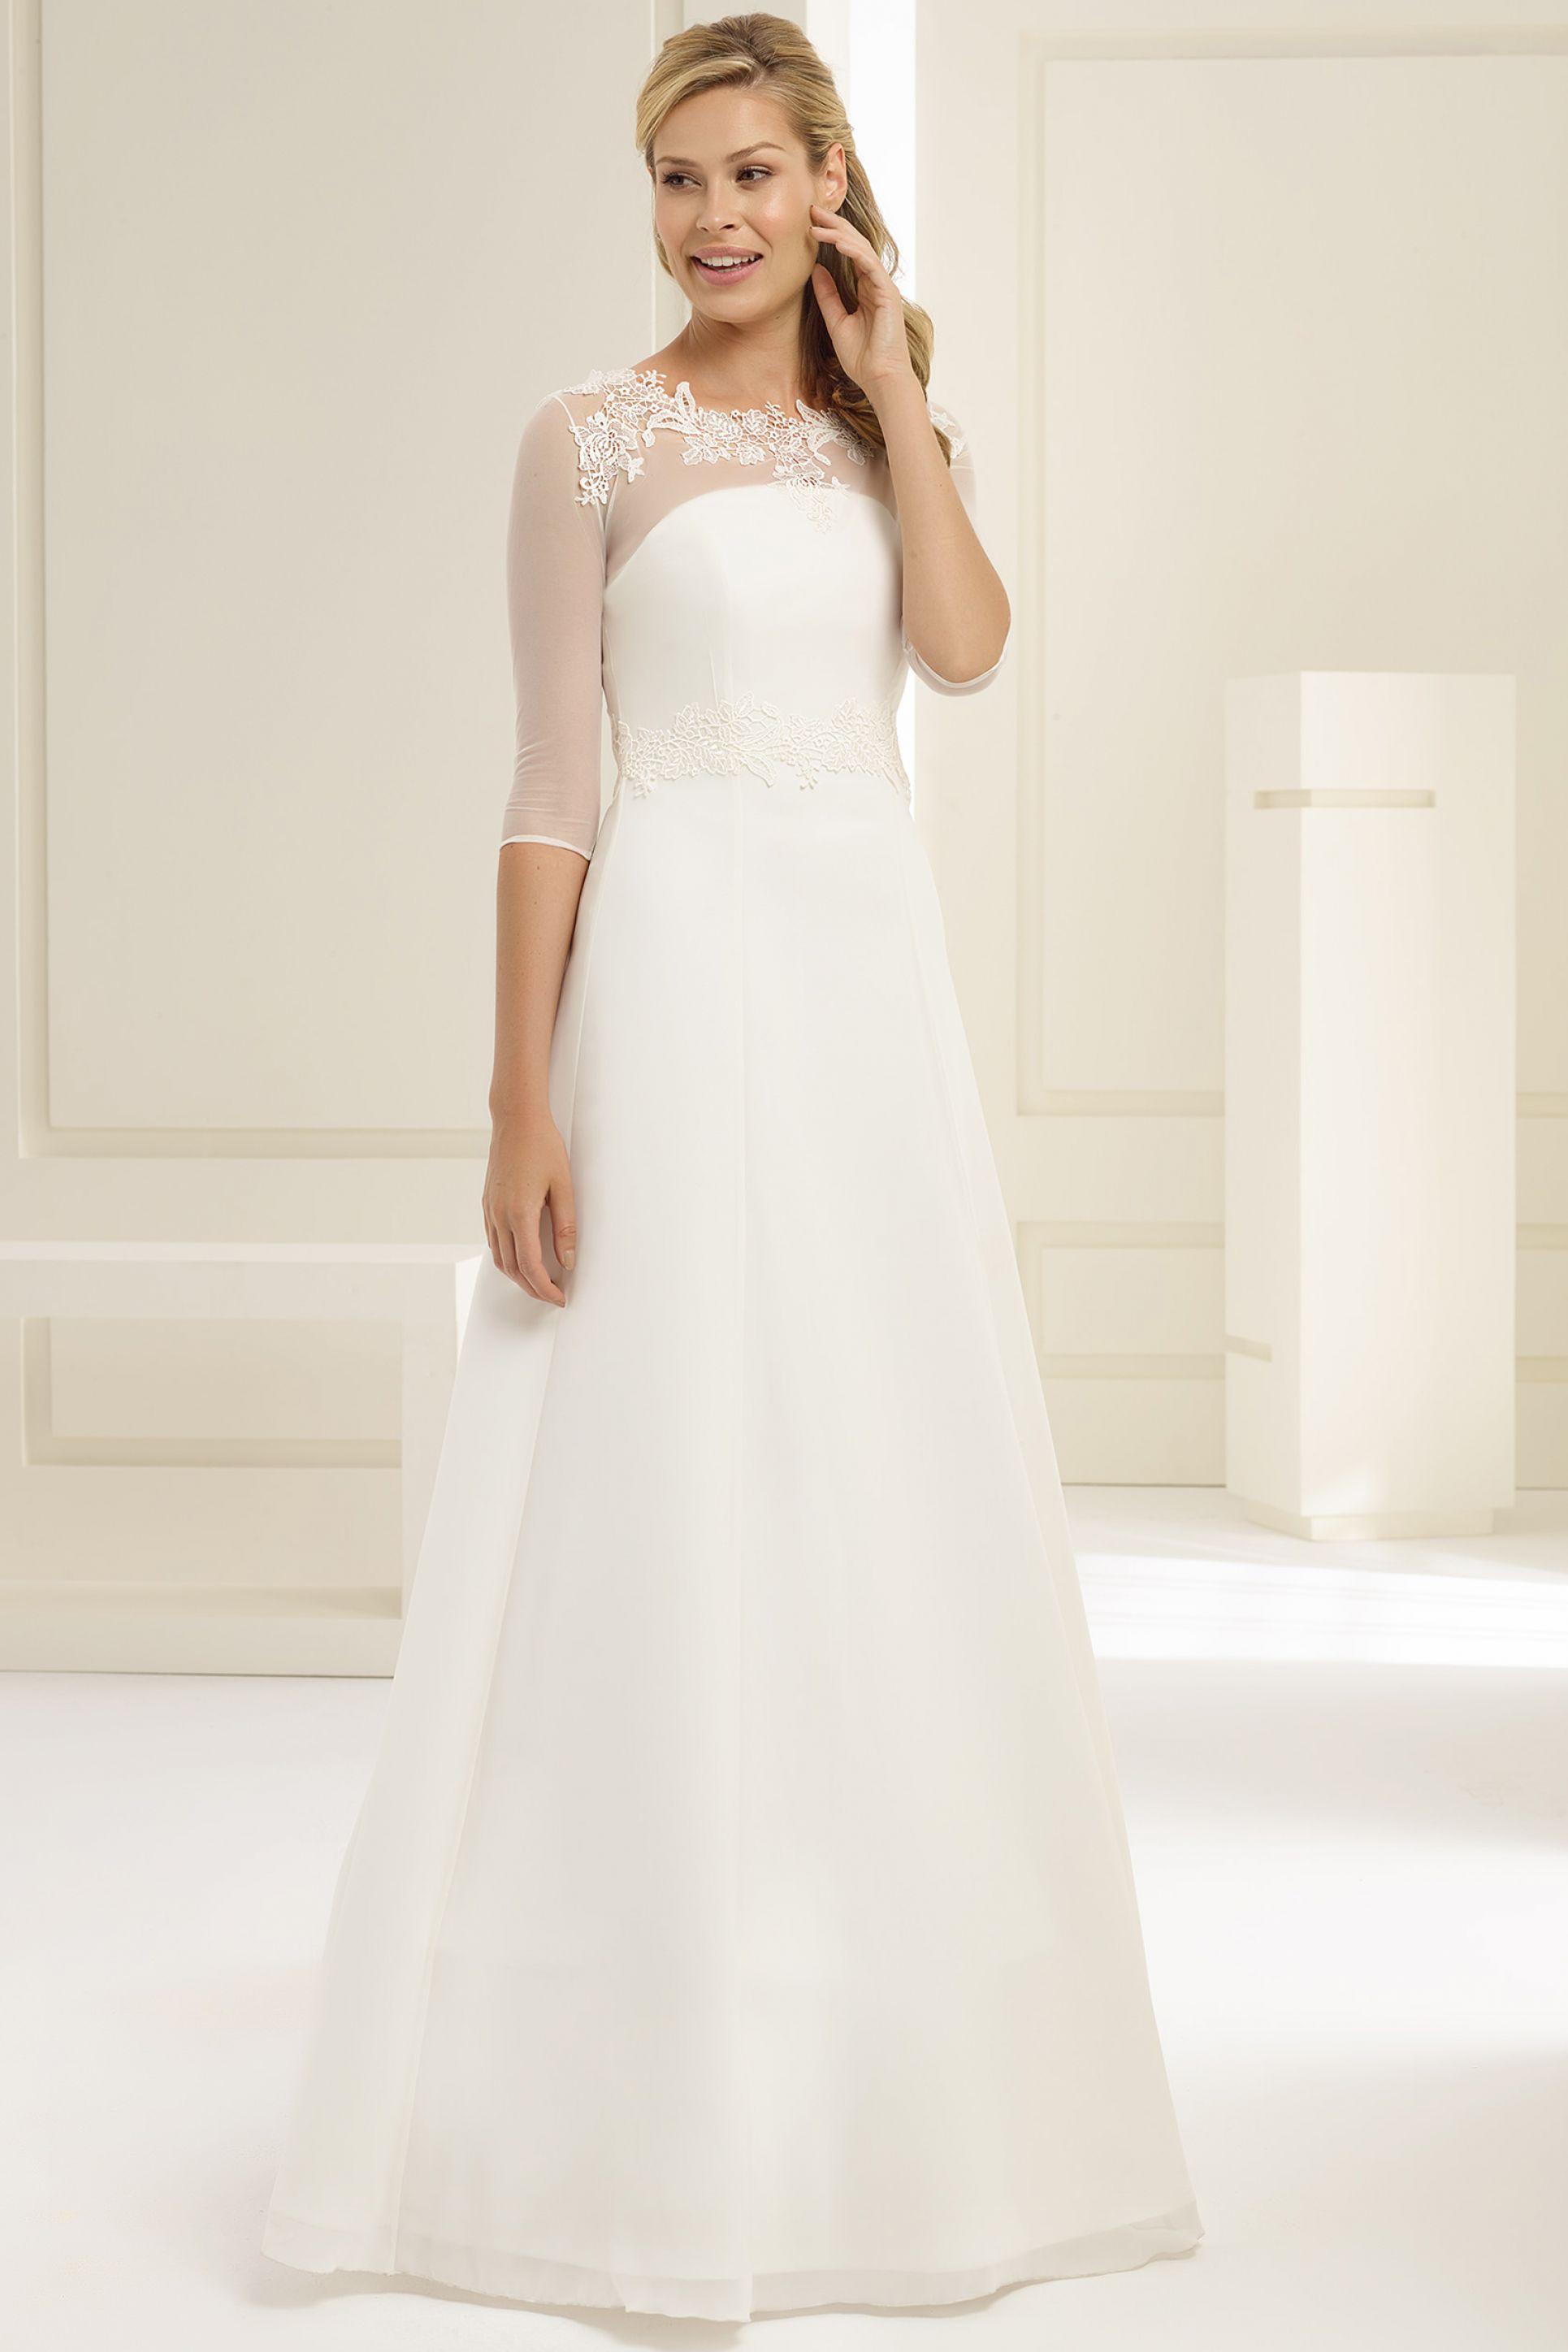 02a317c13810 Νυφικό «Romilda» - Νυφικά Θρησκευτικού Γάμου